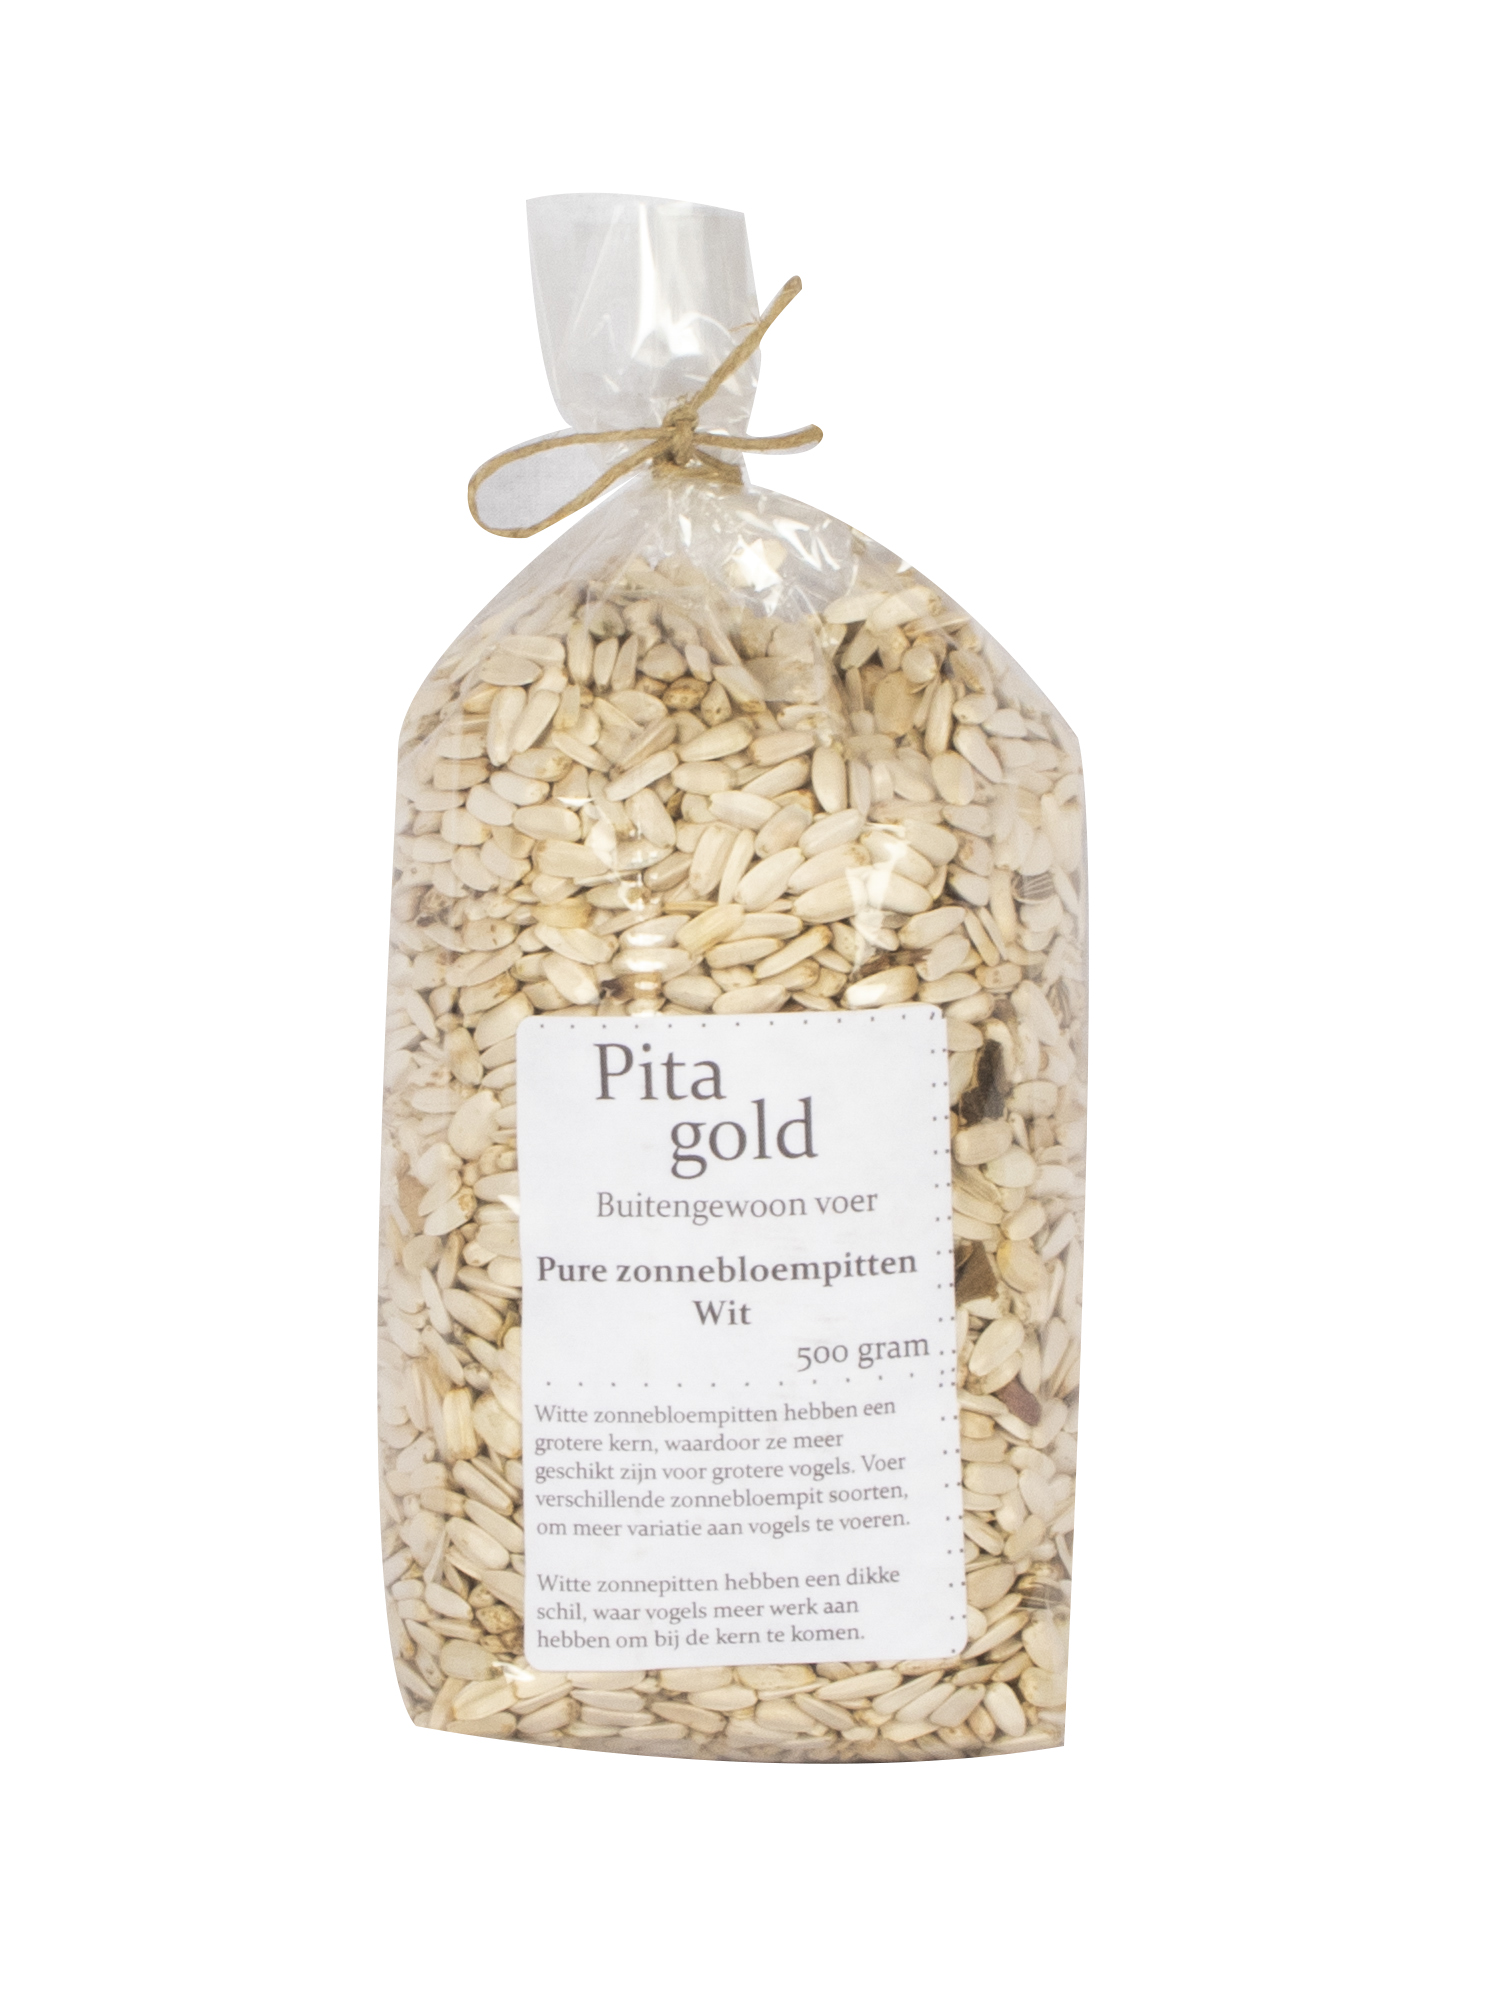 PITA GOLD ZONNEBLOEMPITTEN WIT 500 GRAM